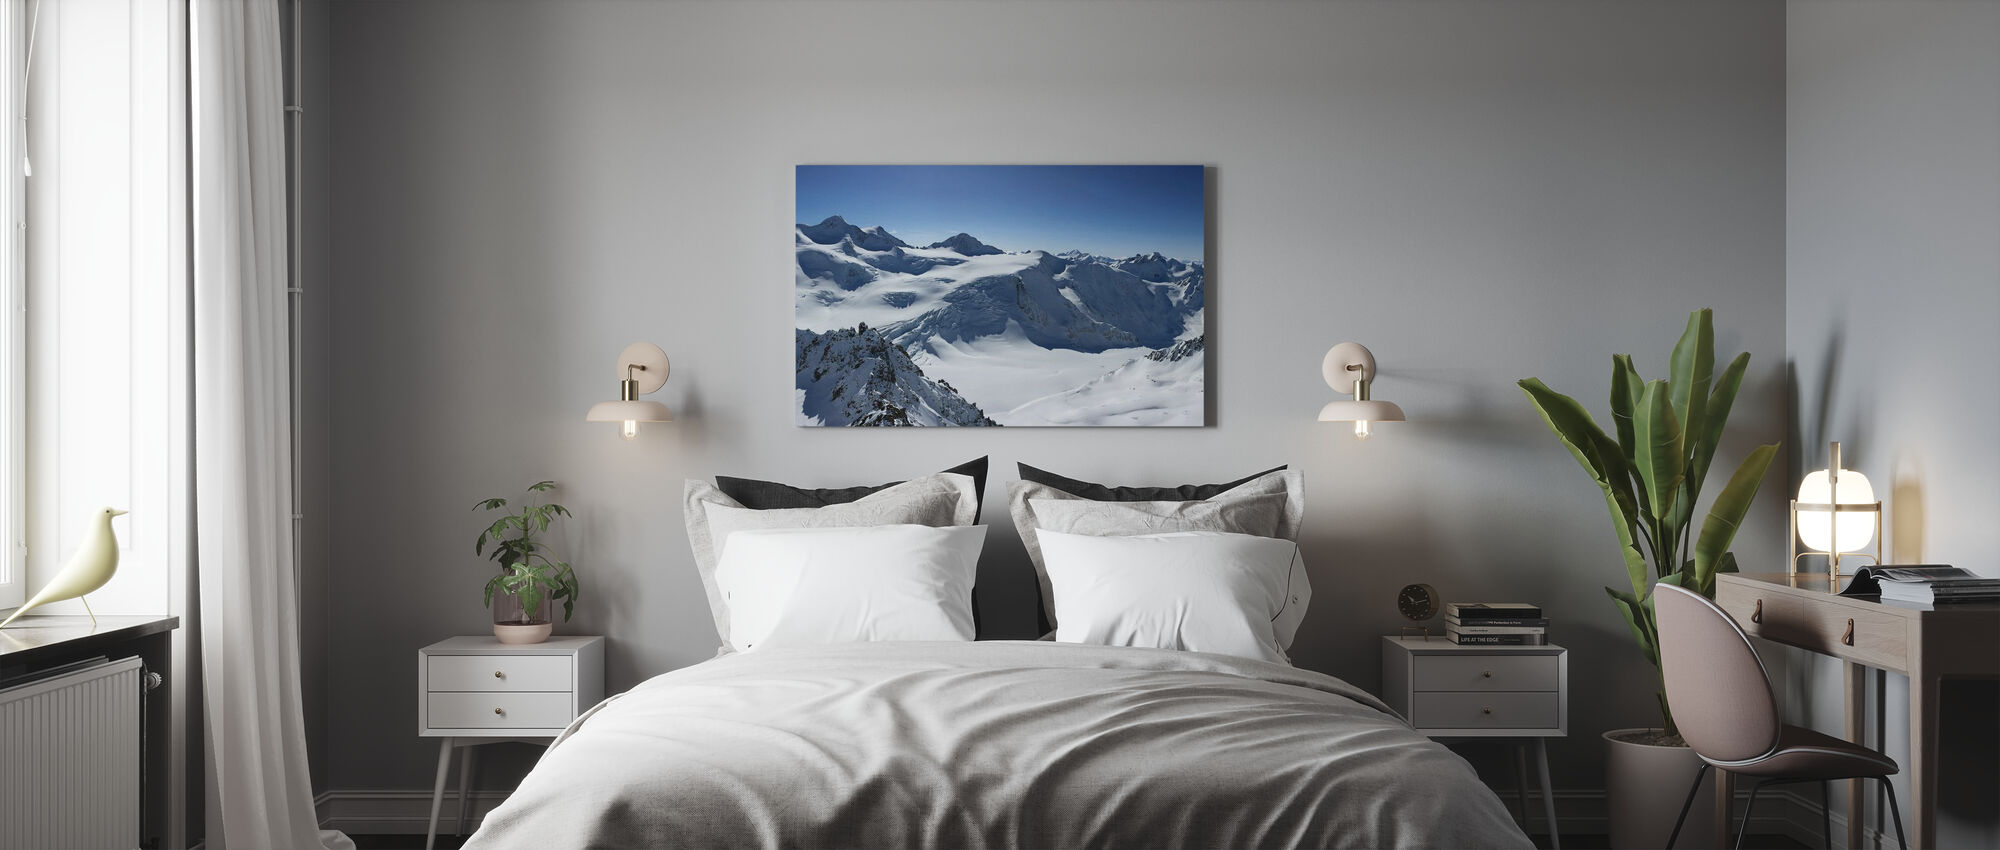 Mountain Summit - Canvas print - Bedroom